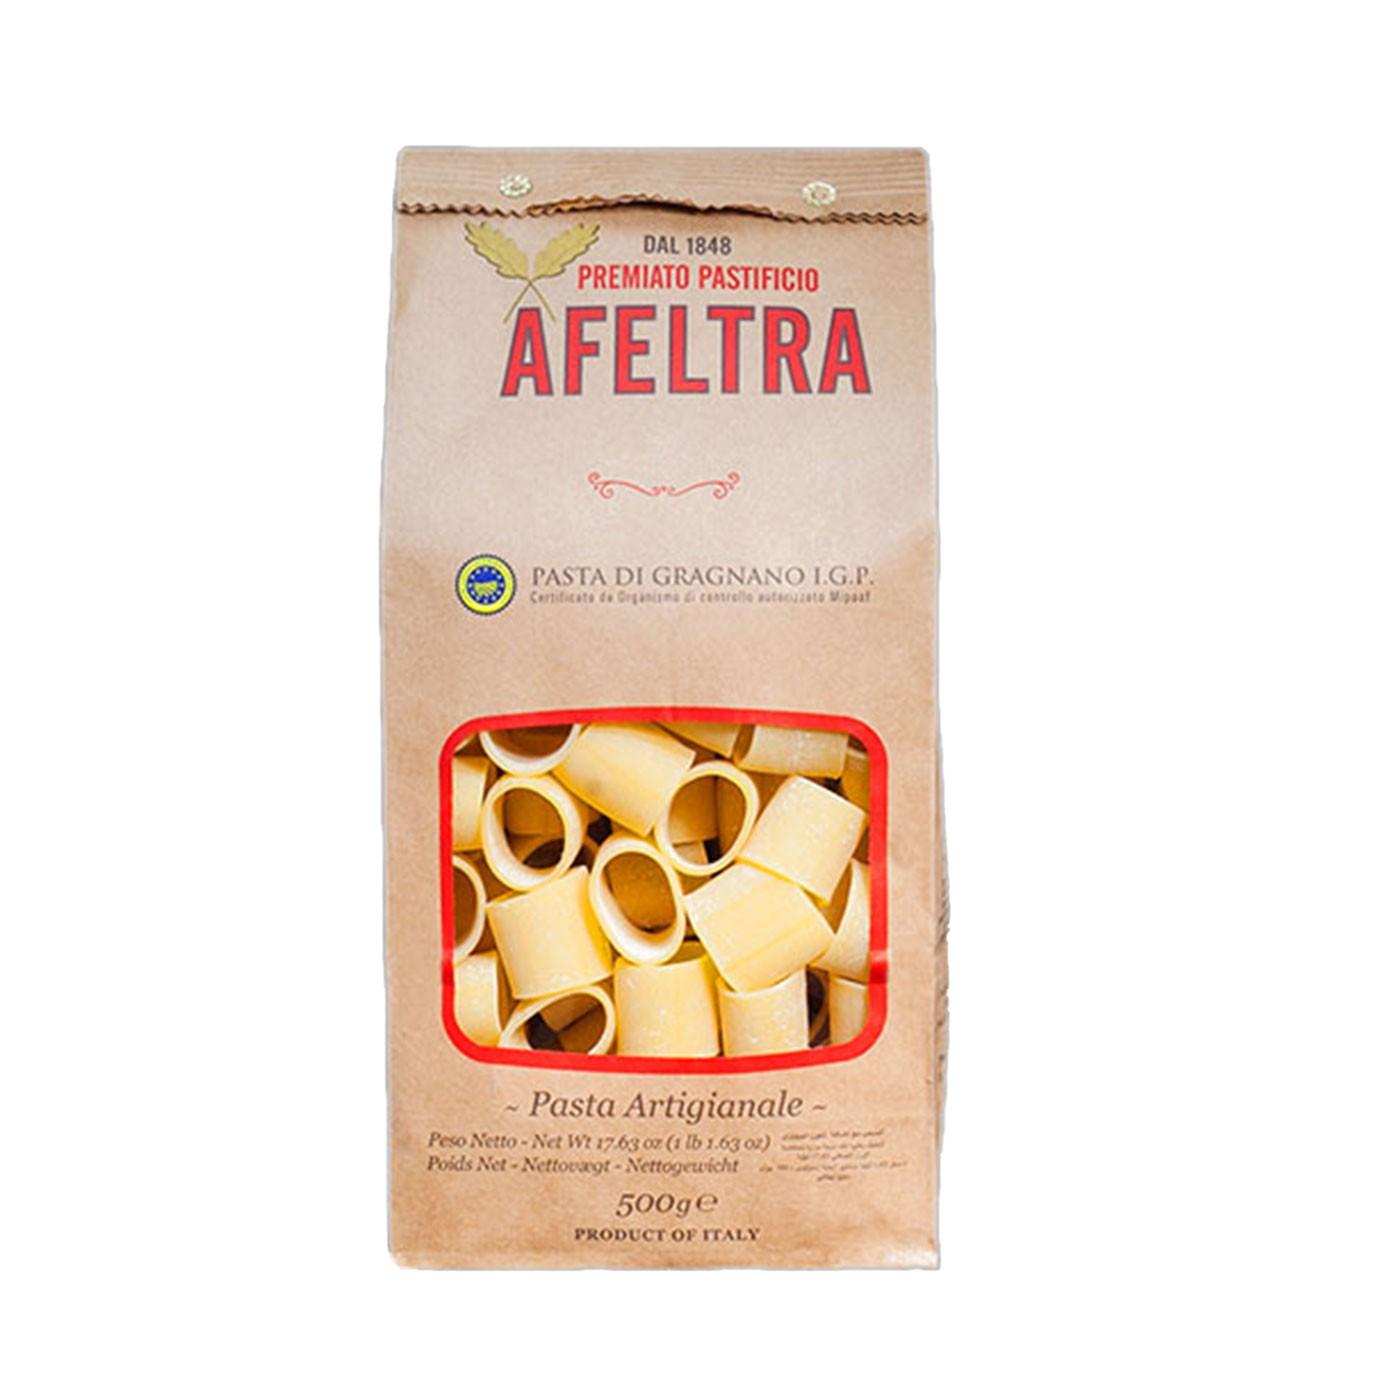 Mezzi Paccheri 17.6 oz - Afeltra